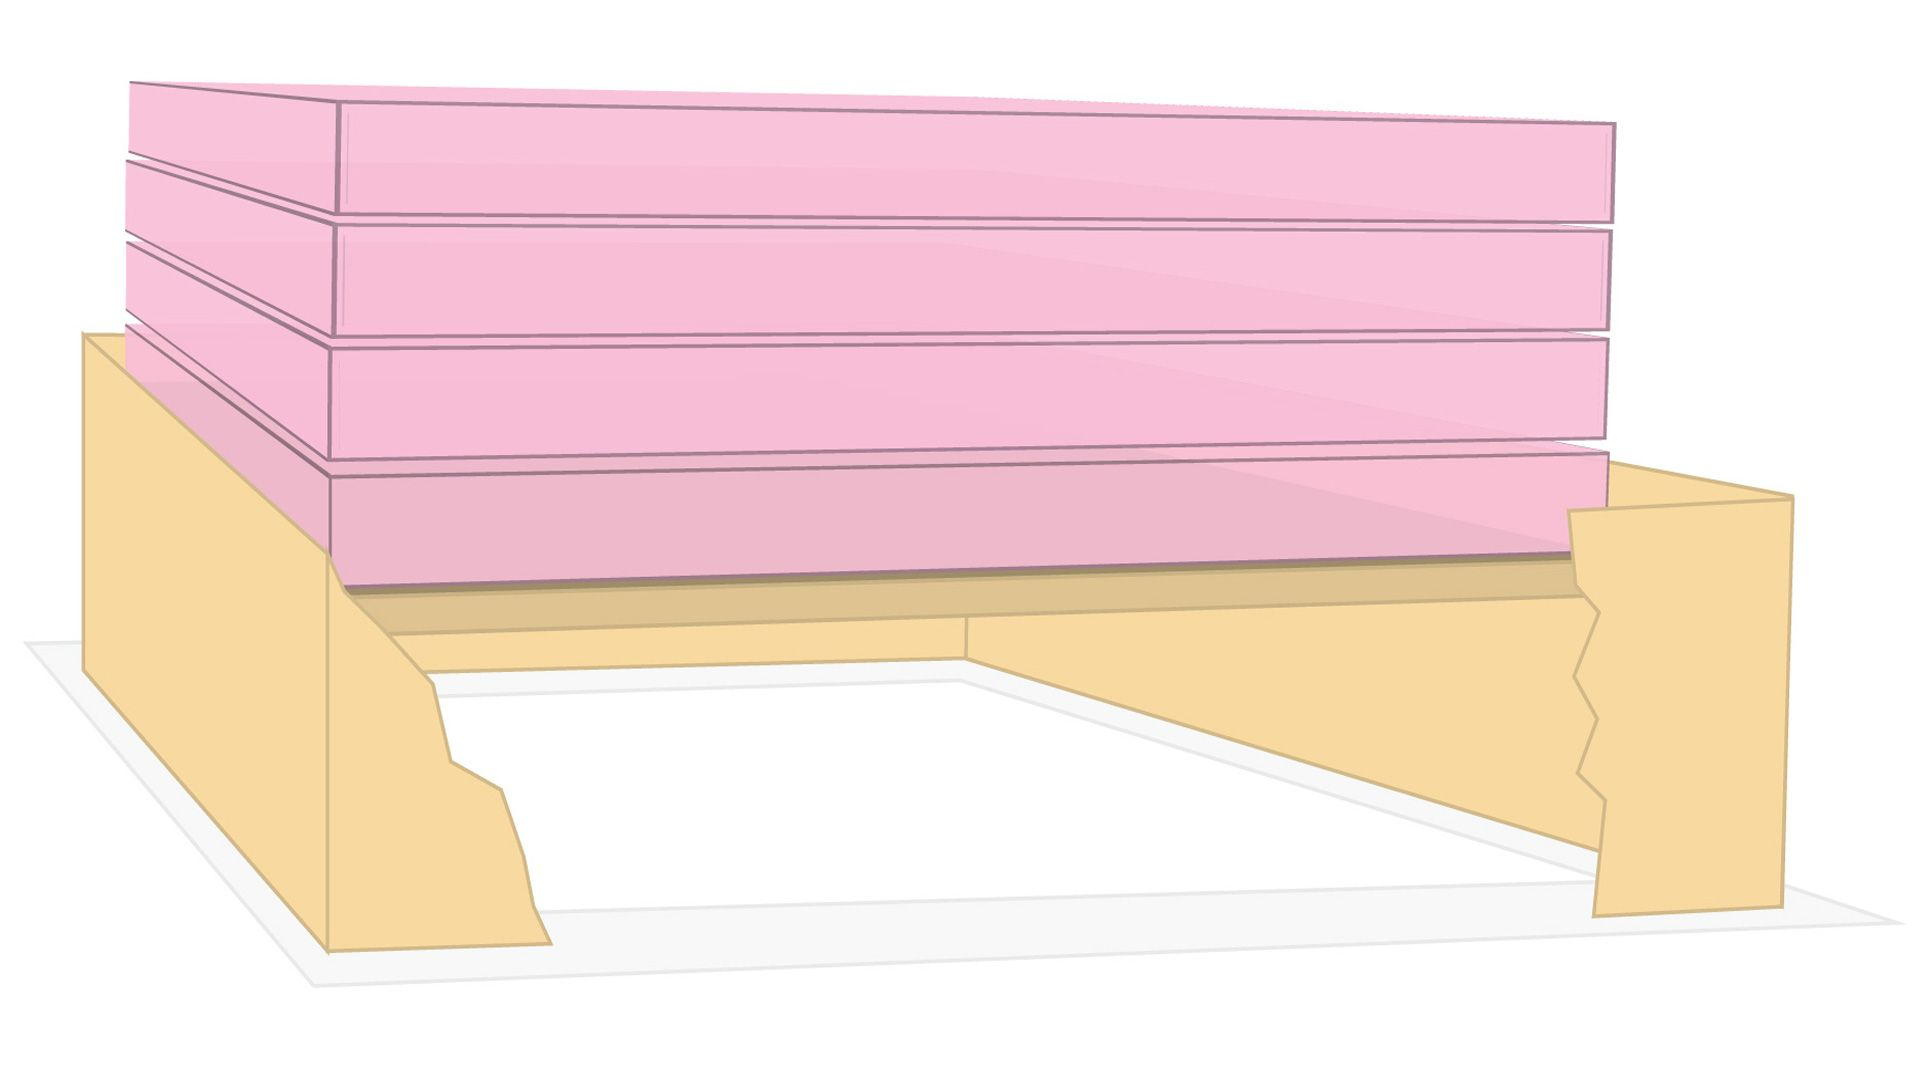 How To Insulate Attic Hatch Panels Diy House Help Attic Remodel Attic Renovation Attic Design